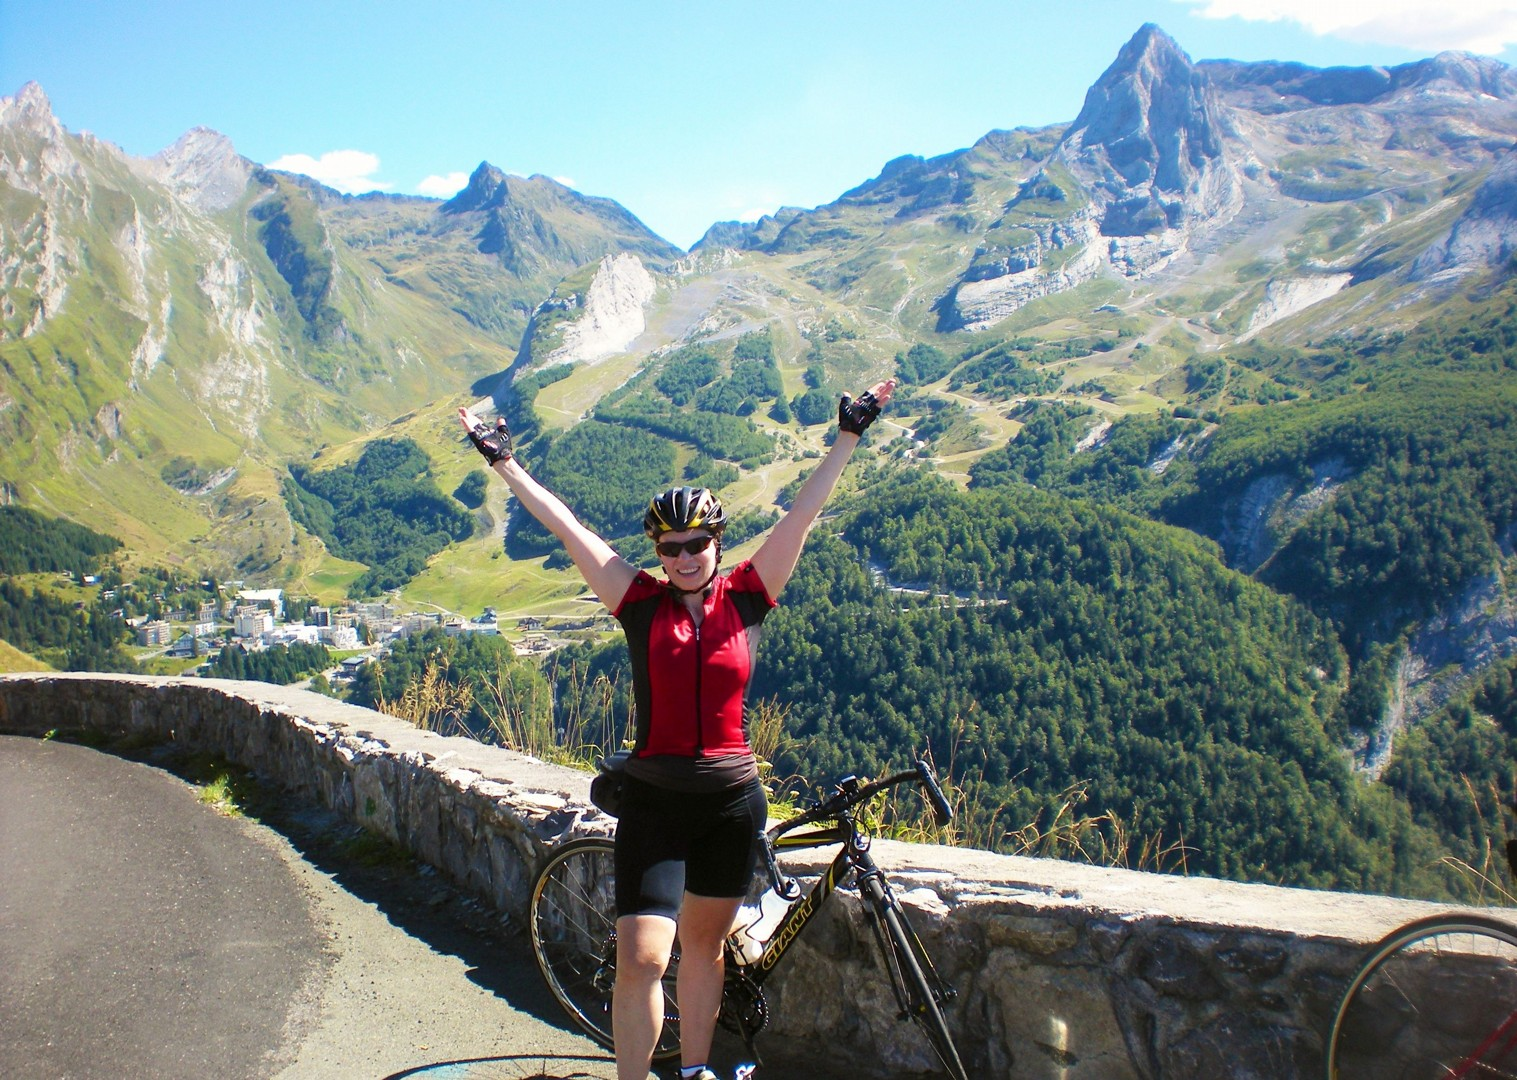 france-pyrenees-cycling-holiday.jpg - France - Pyrenees Fitness Week (Grade 2-3) - Road Cycling